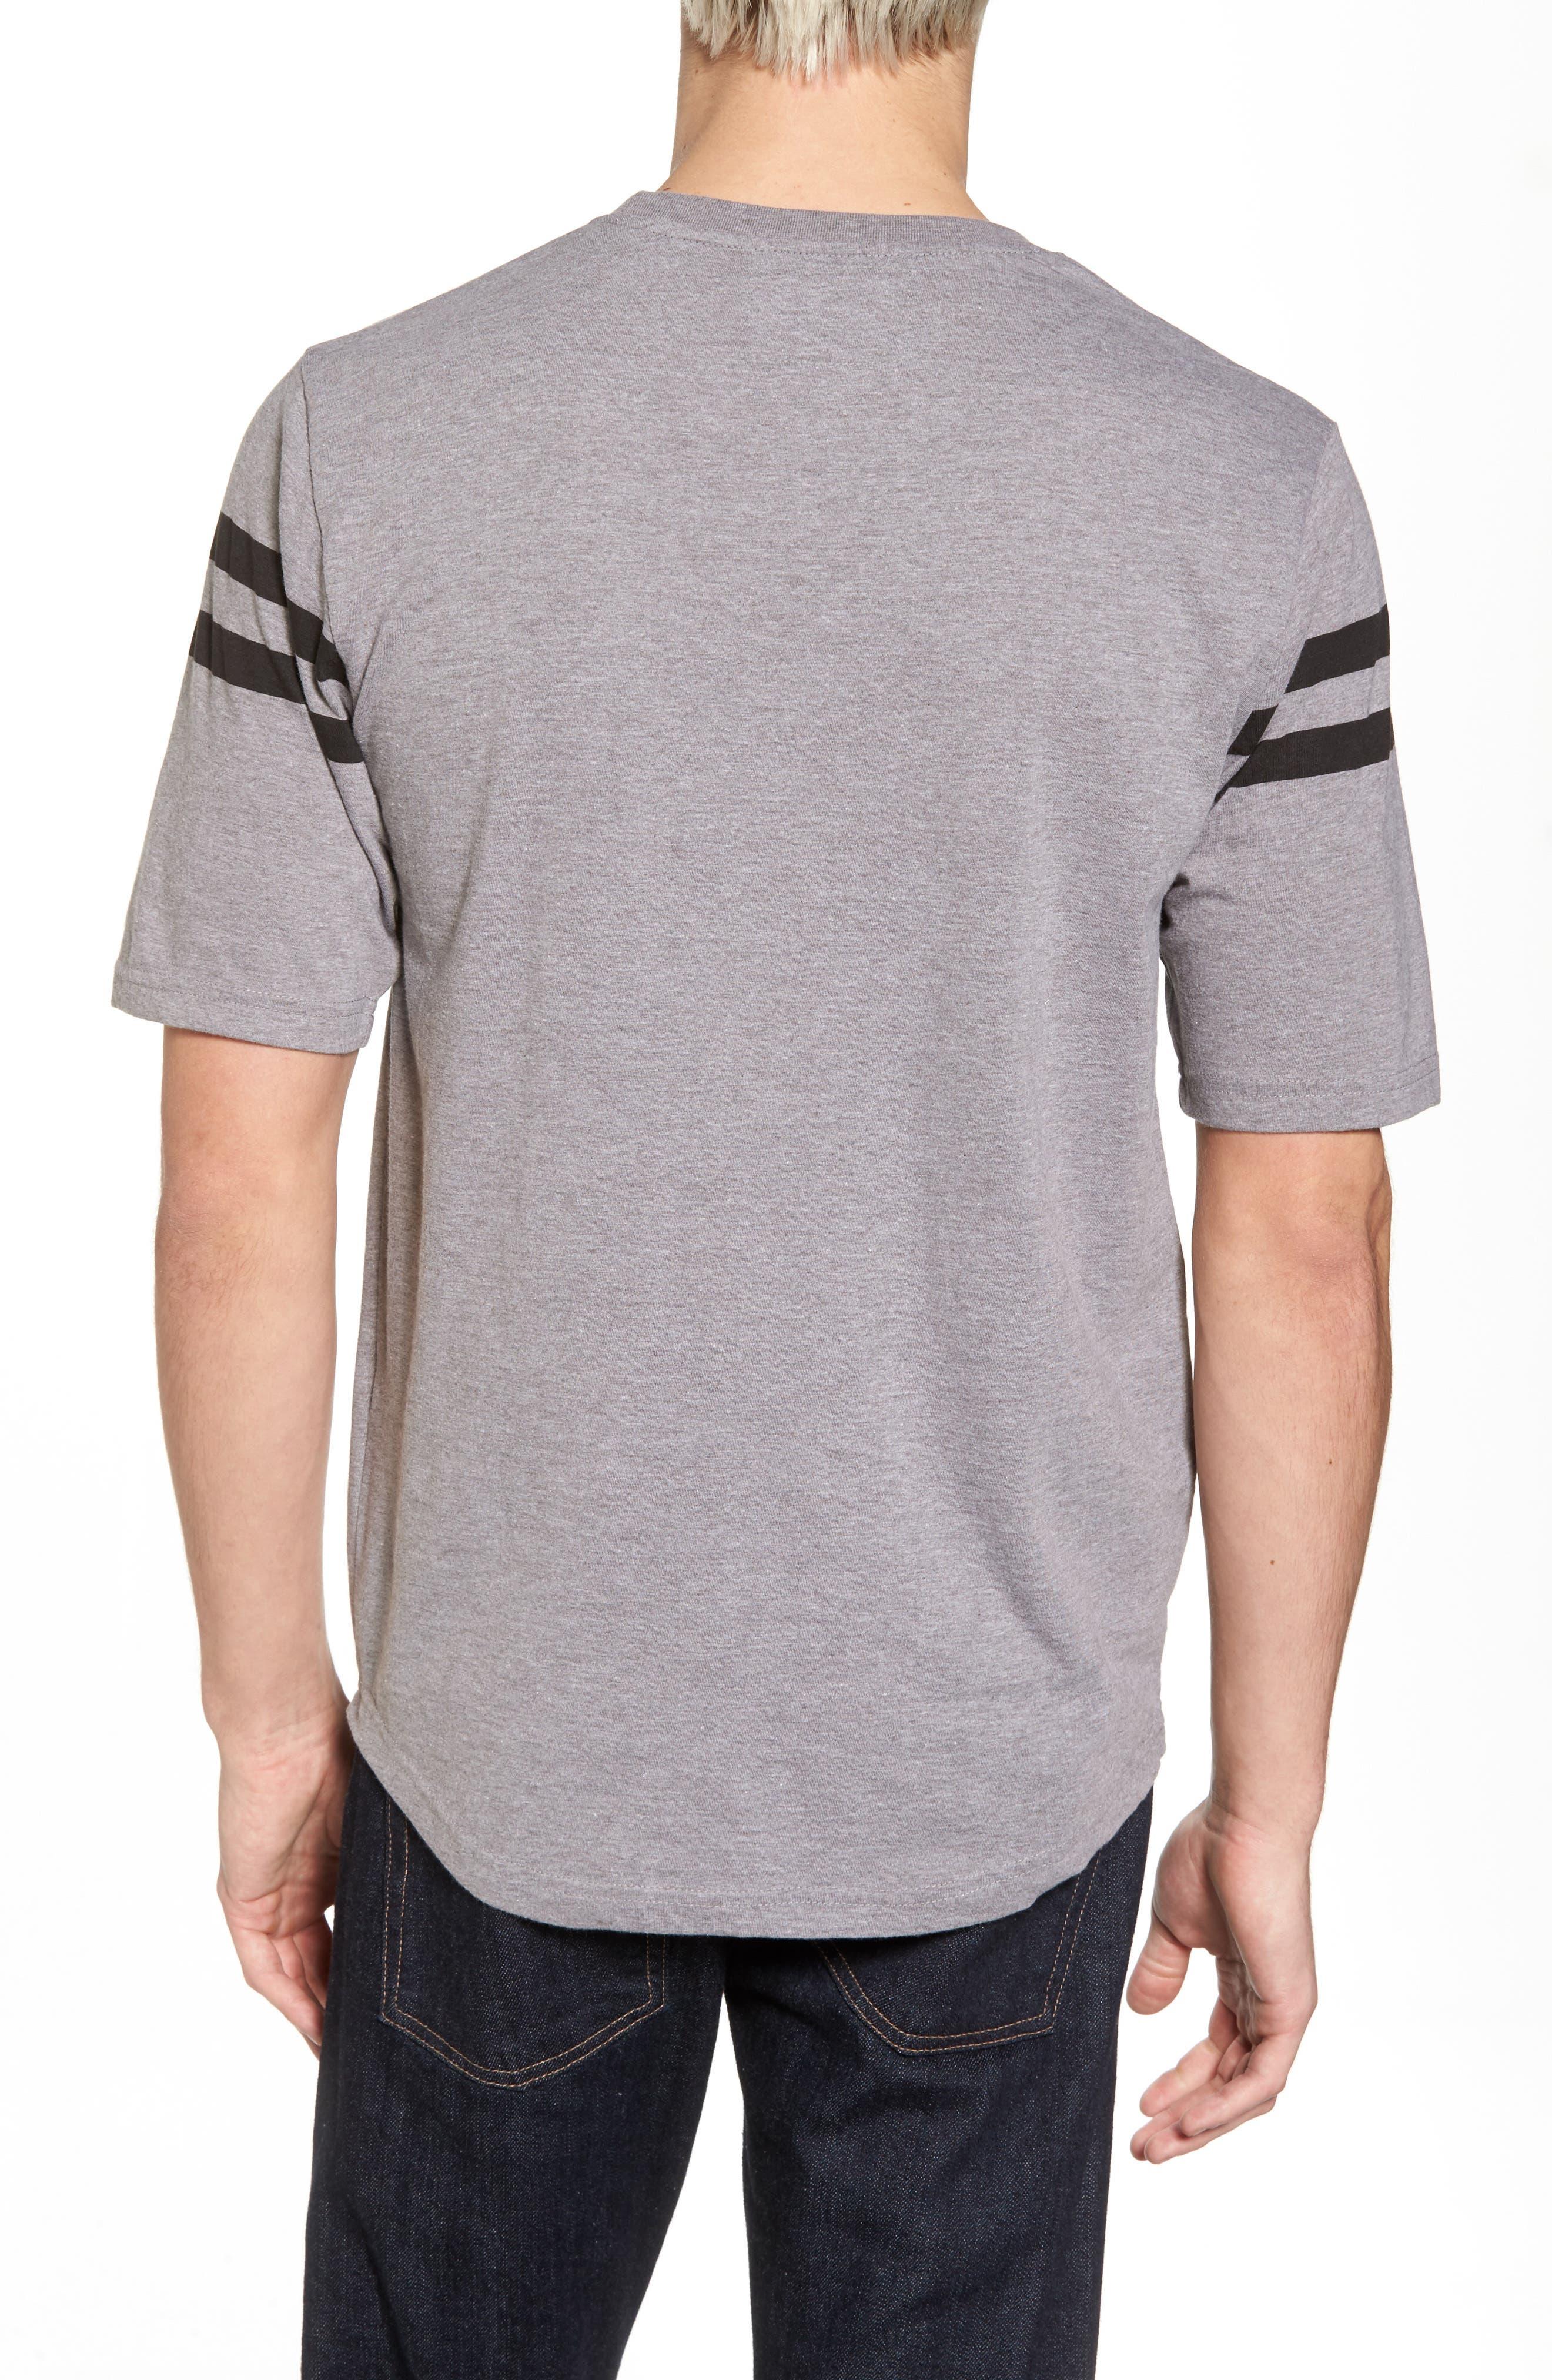 Crosby Chicago Blackhawks T-Shirt,                             Alternate thumbnail 2, color,                             Heather Grey